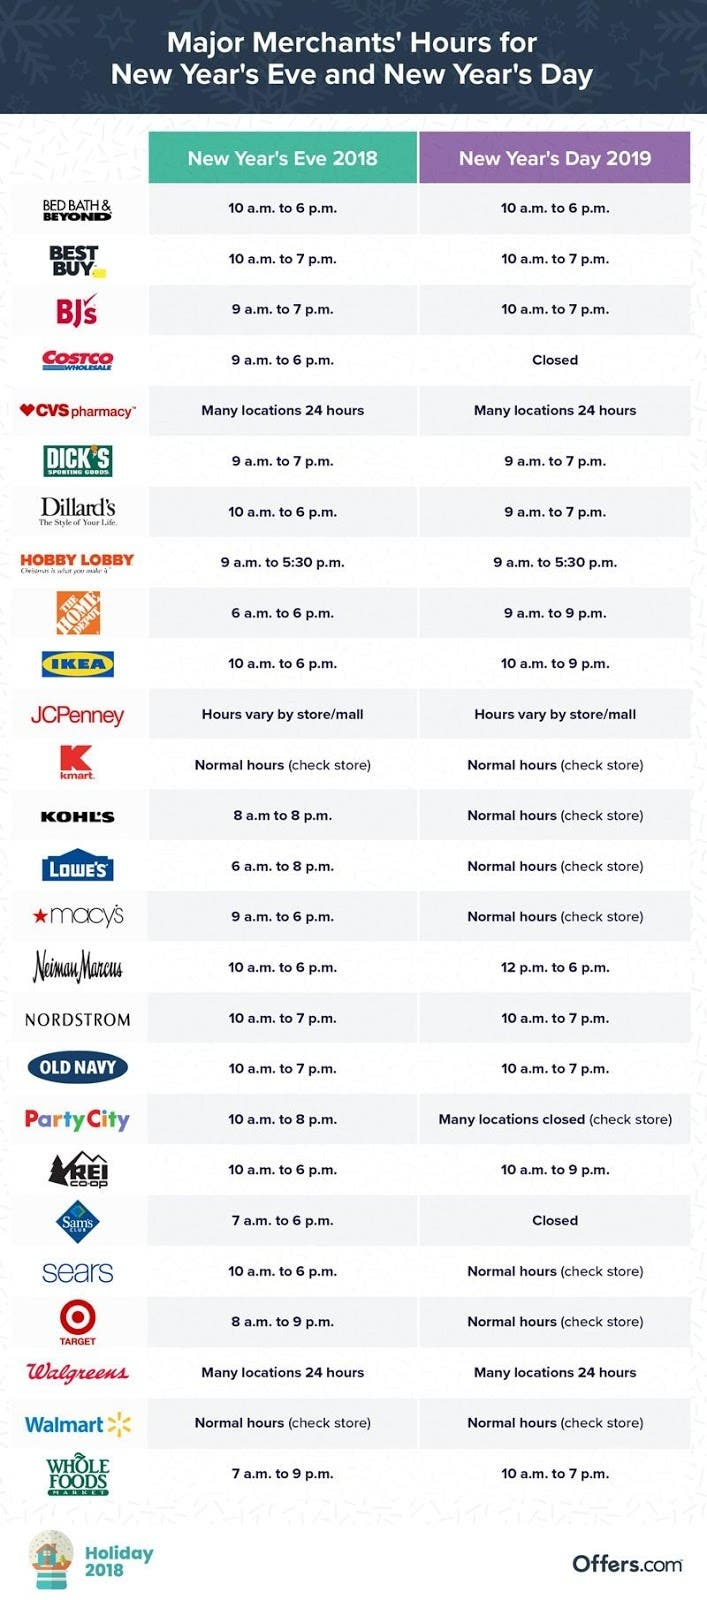 Publix Christmas Eve Hours 2019 Publix, Winn Dixie, Walmart: New Year 2019 Florida Grocery Hours